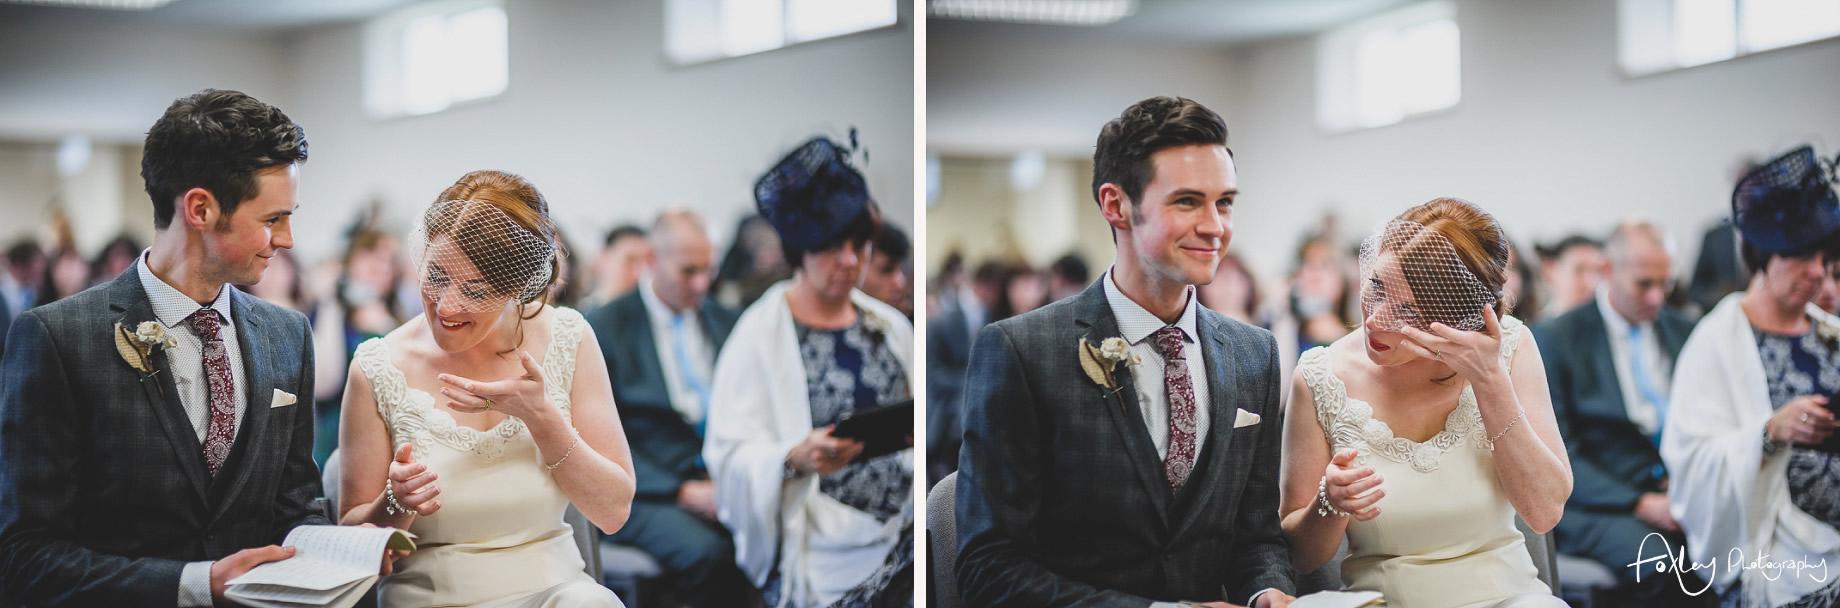 Mel-and-Lewis-Wedding-at-Barley-Village-Hall-095